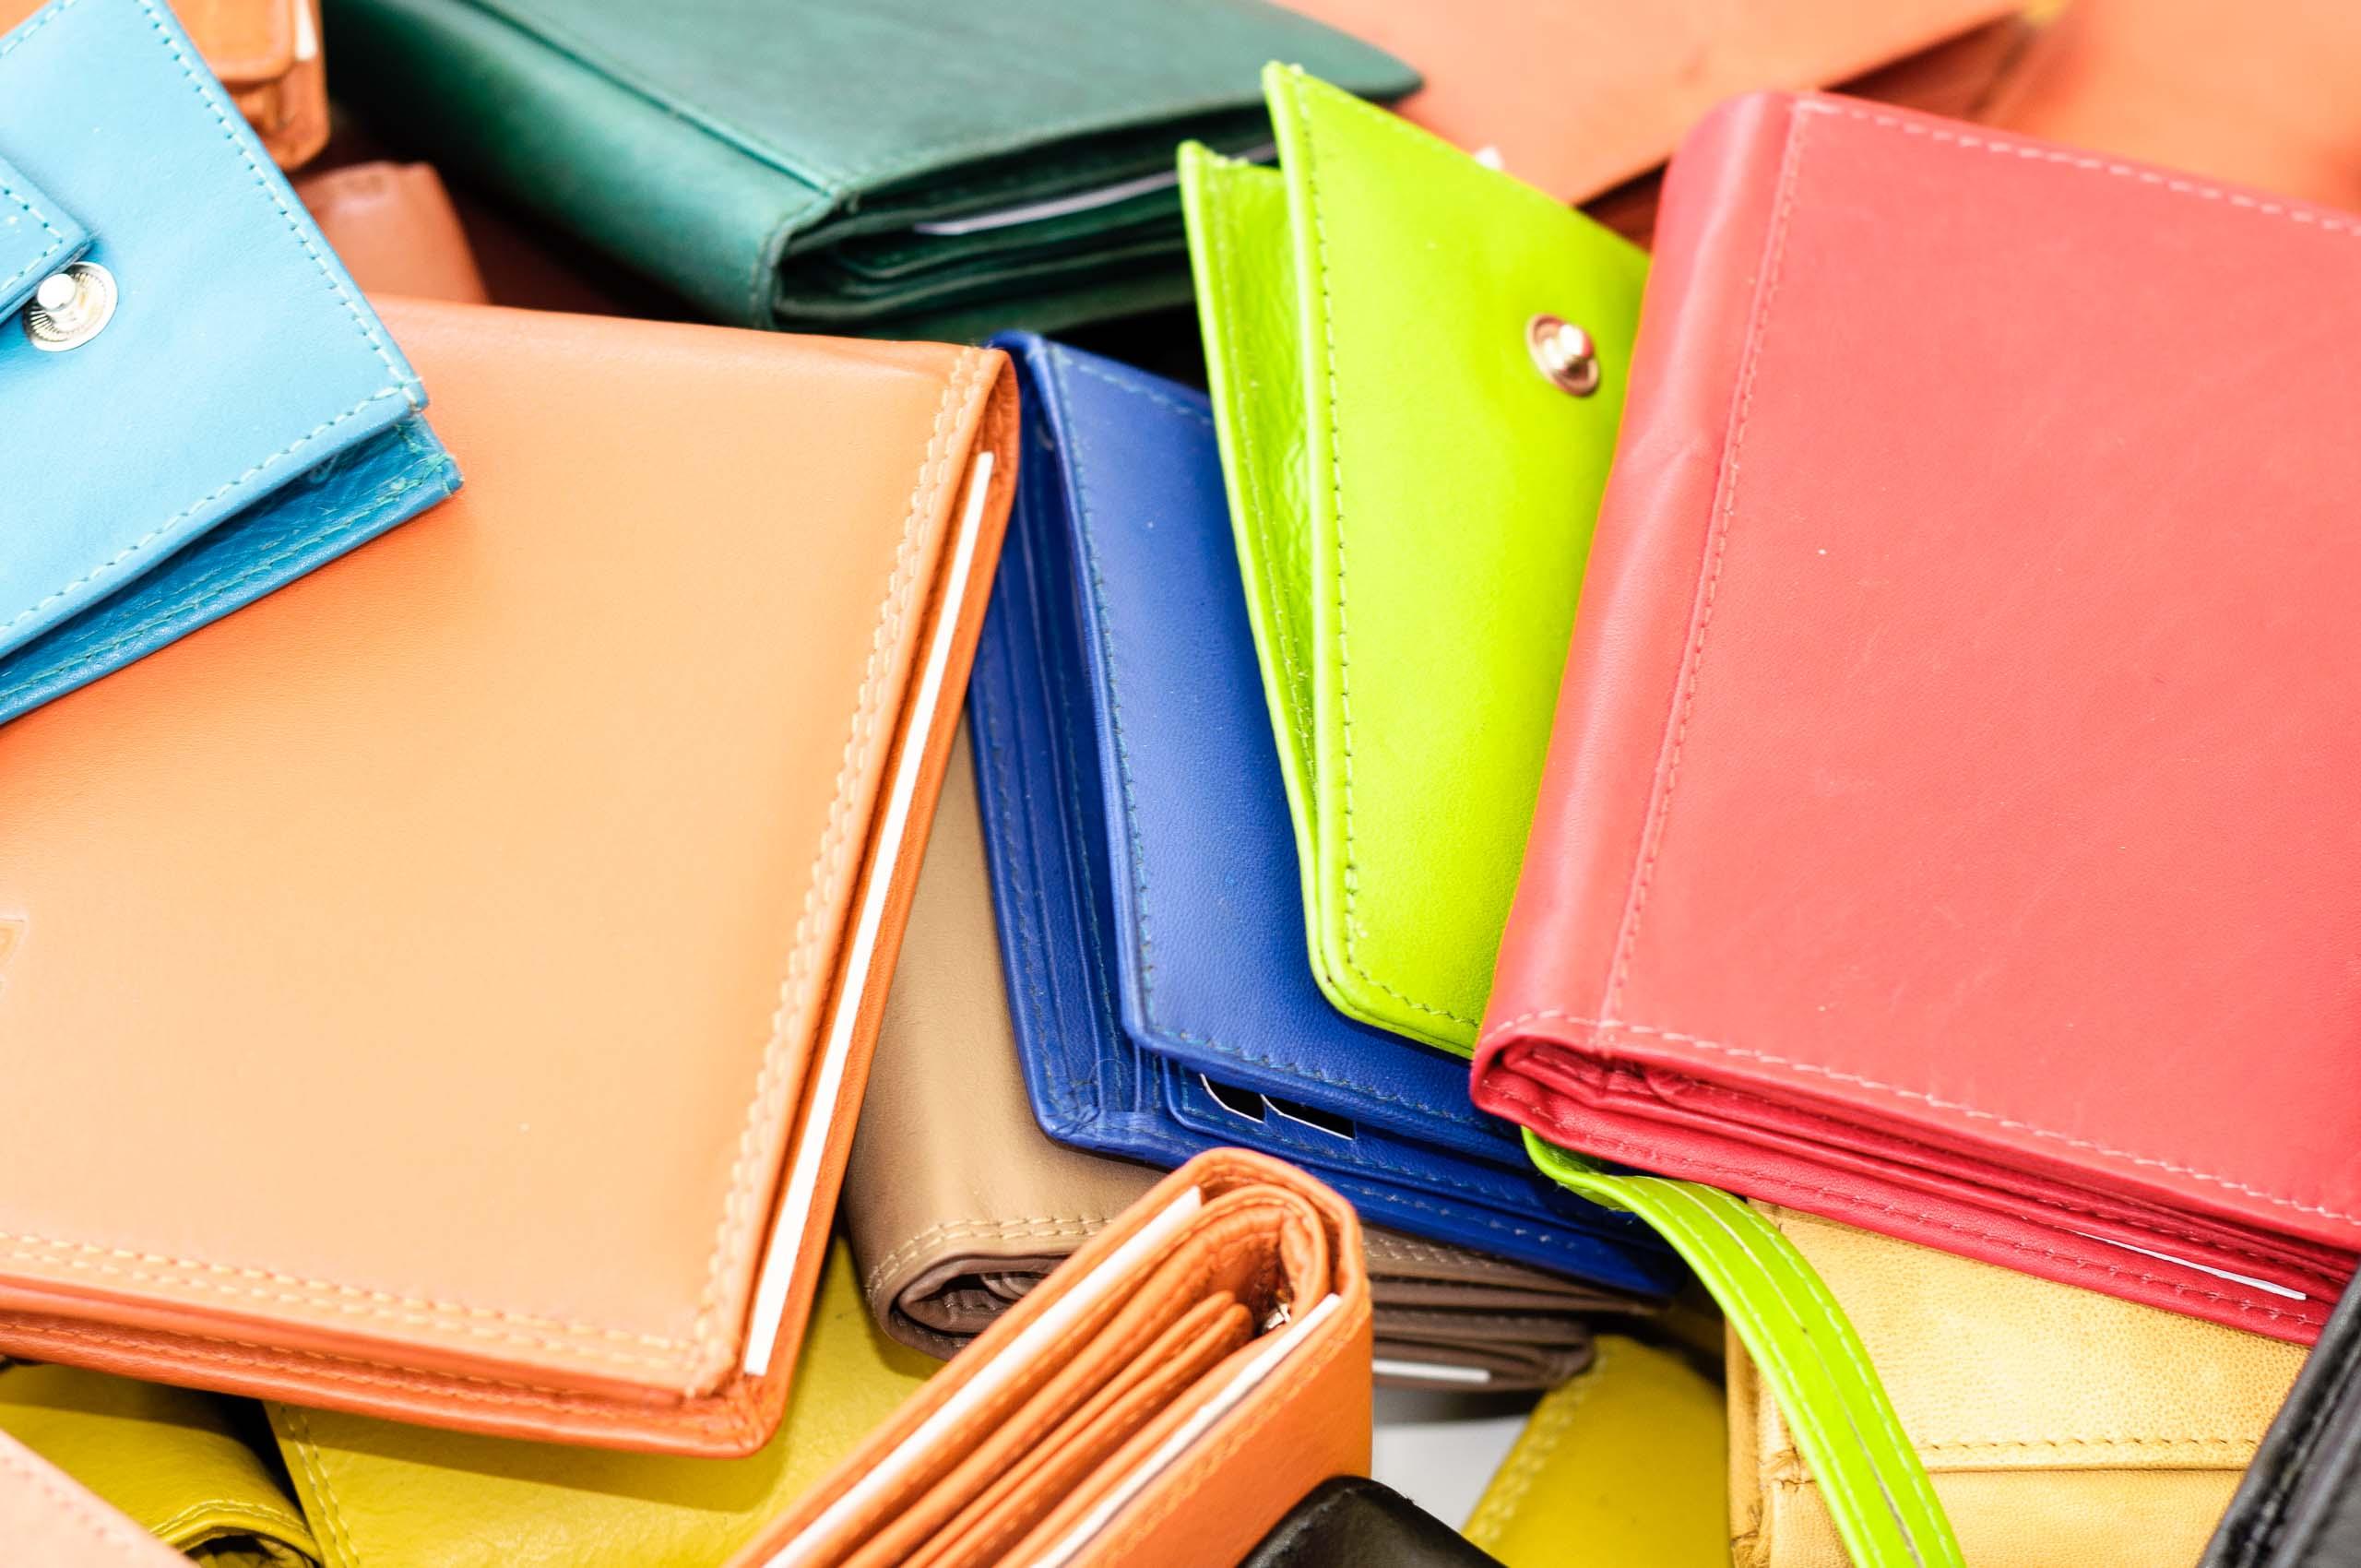 geldboerse,portemonaie,farbig,bunt,leder,nahaufnahme,details